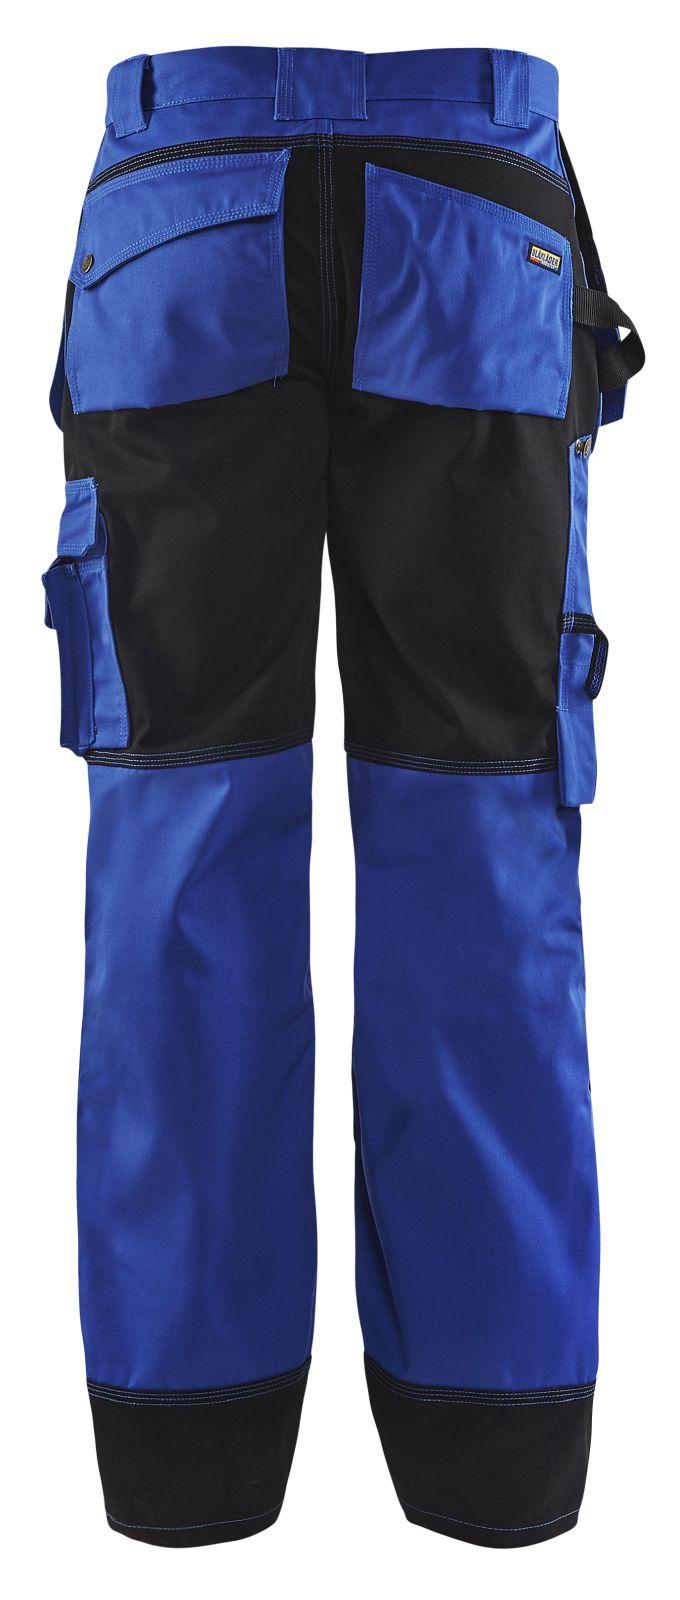 Blaklader Werkbroeken 15031860 korenblauw-zwart(8599)